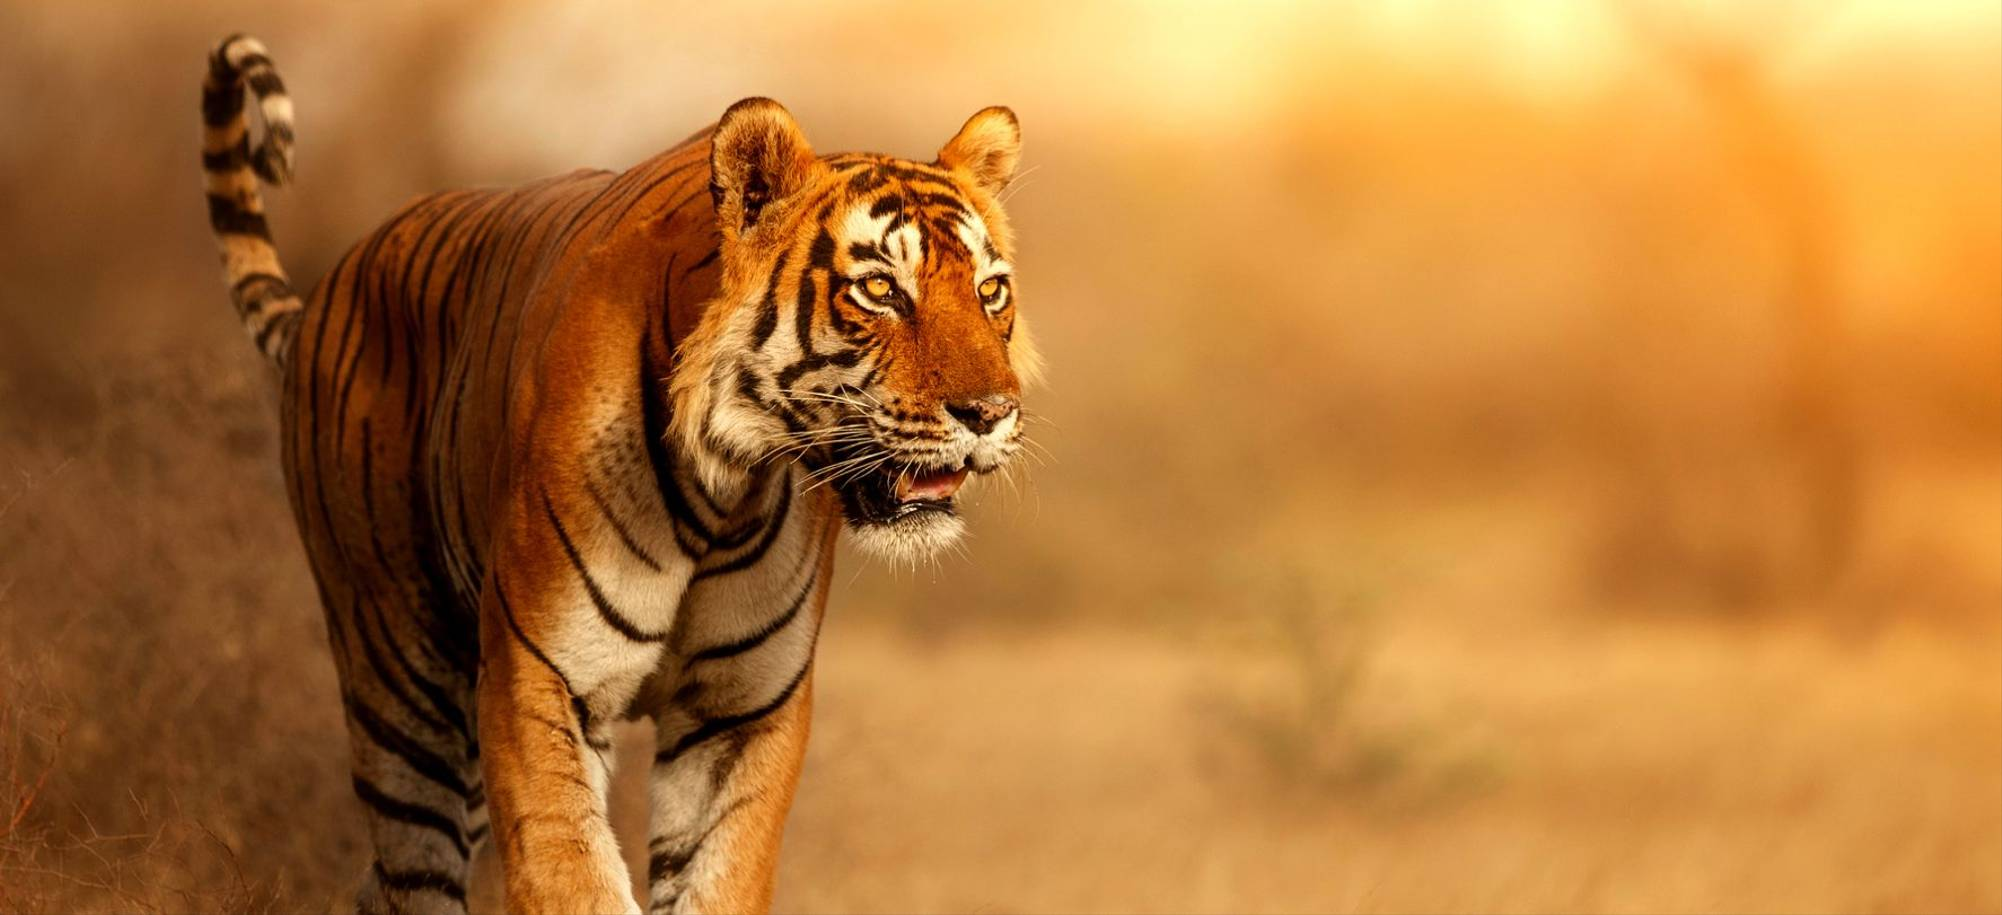 21 Day -  Ranthambhore Tiger Reserve -Itinerary Desktop.jpg